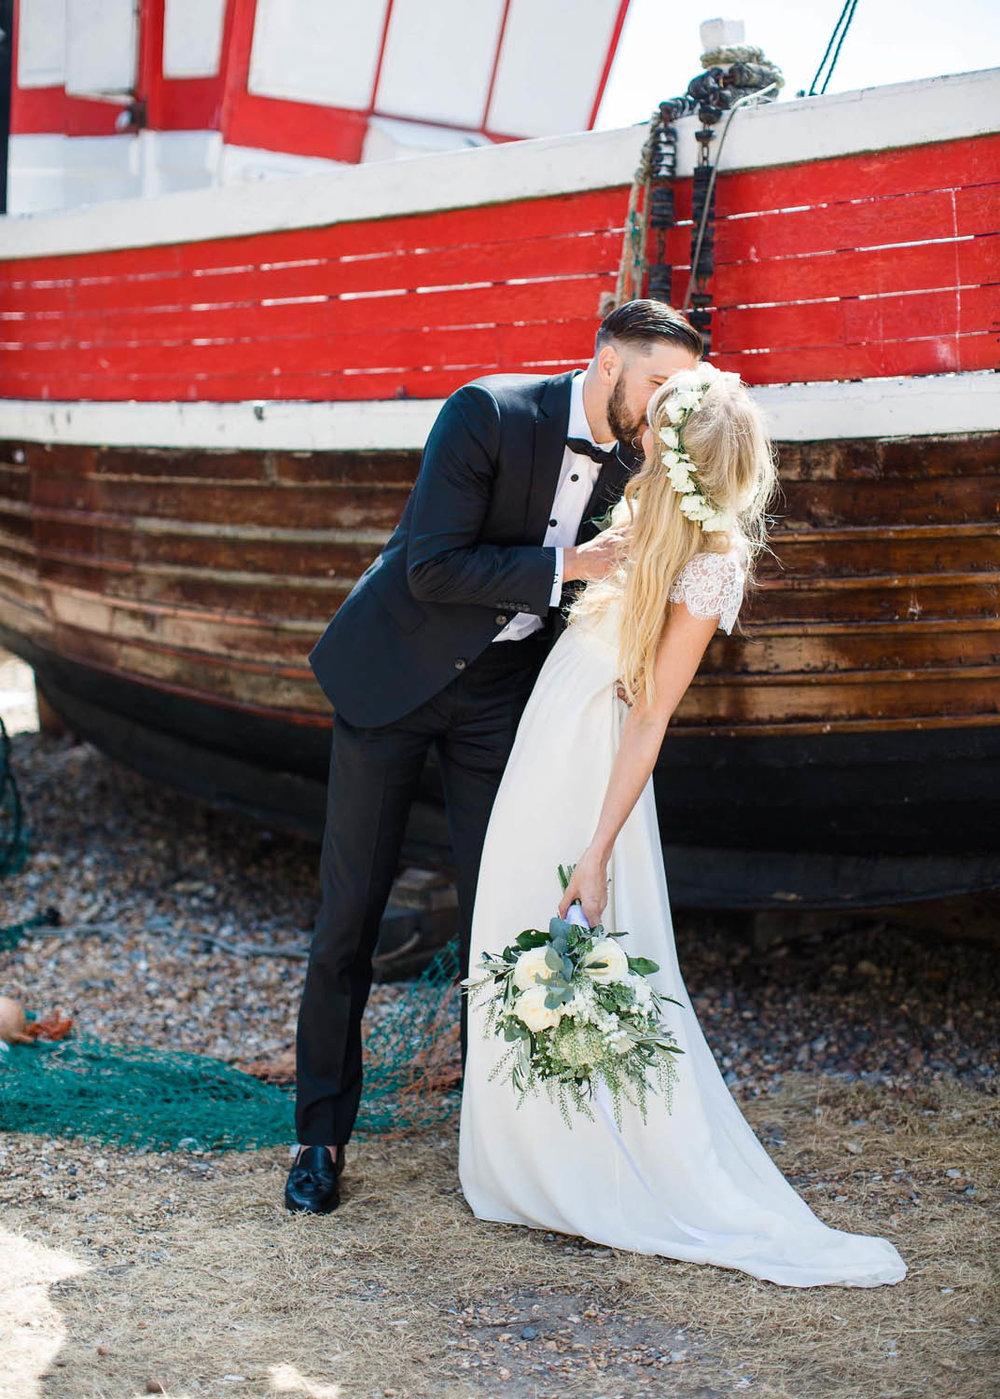 Amy O'Boyle Photography, Destination & UK Fine Art Film Wedding Photographer, Hastings Wedding-22.jpg